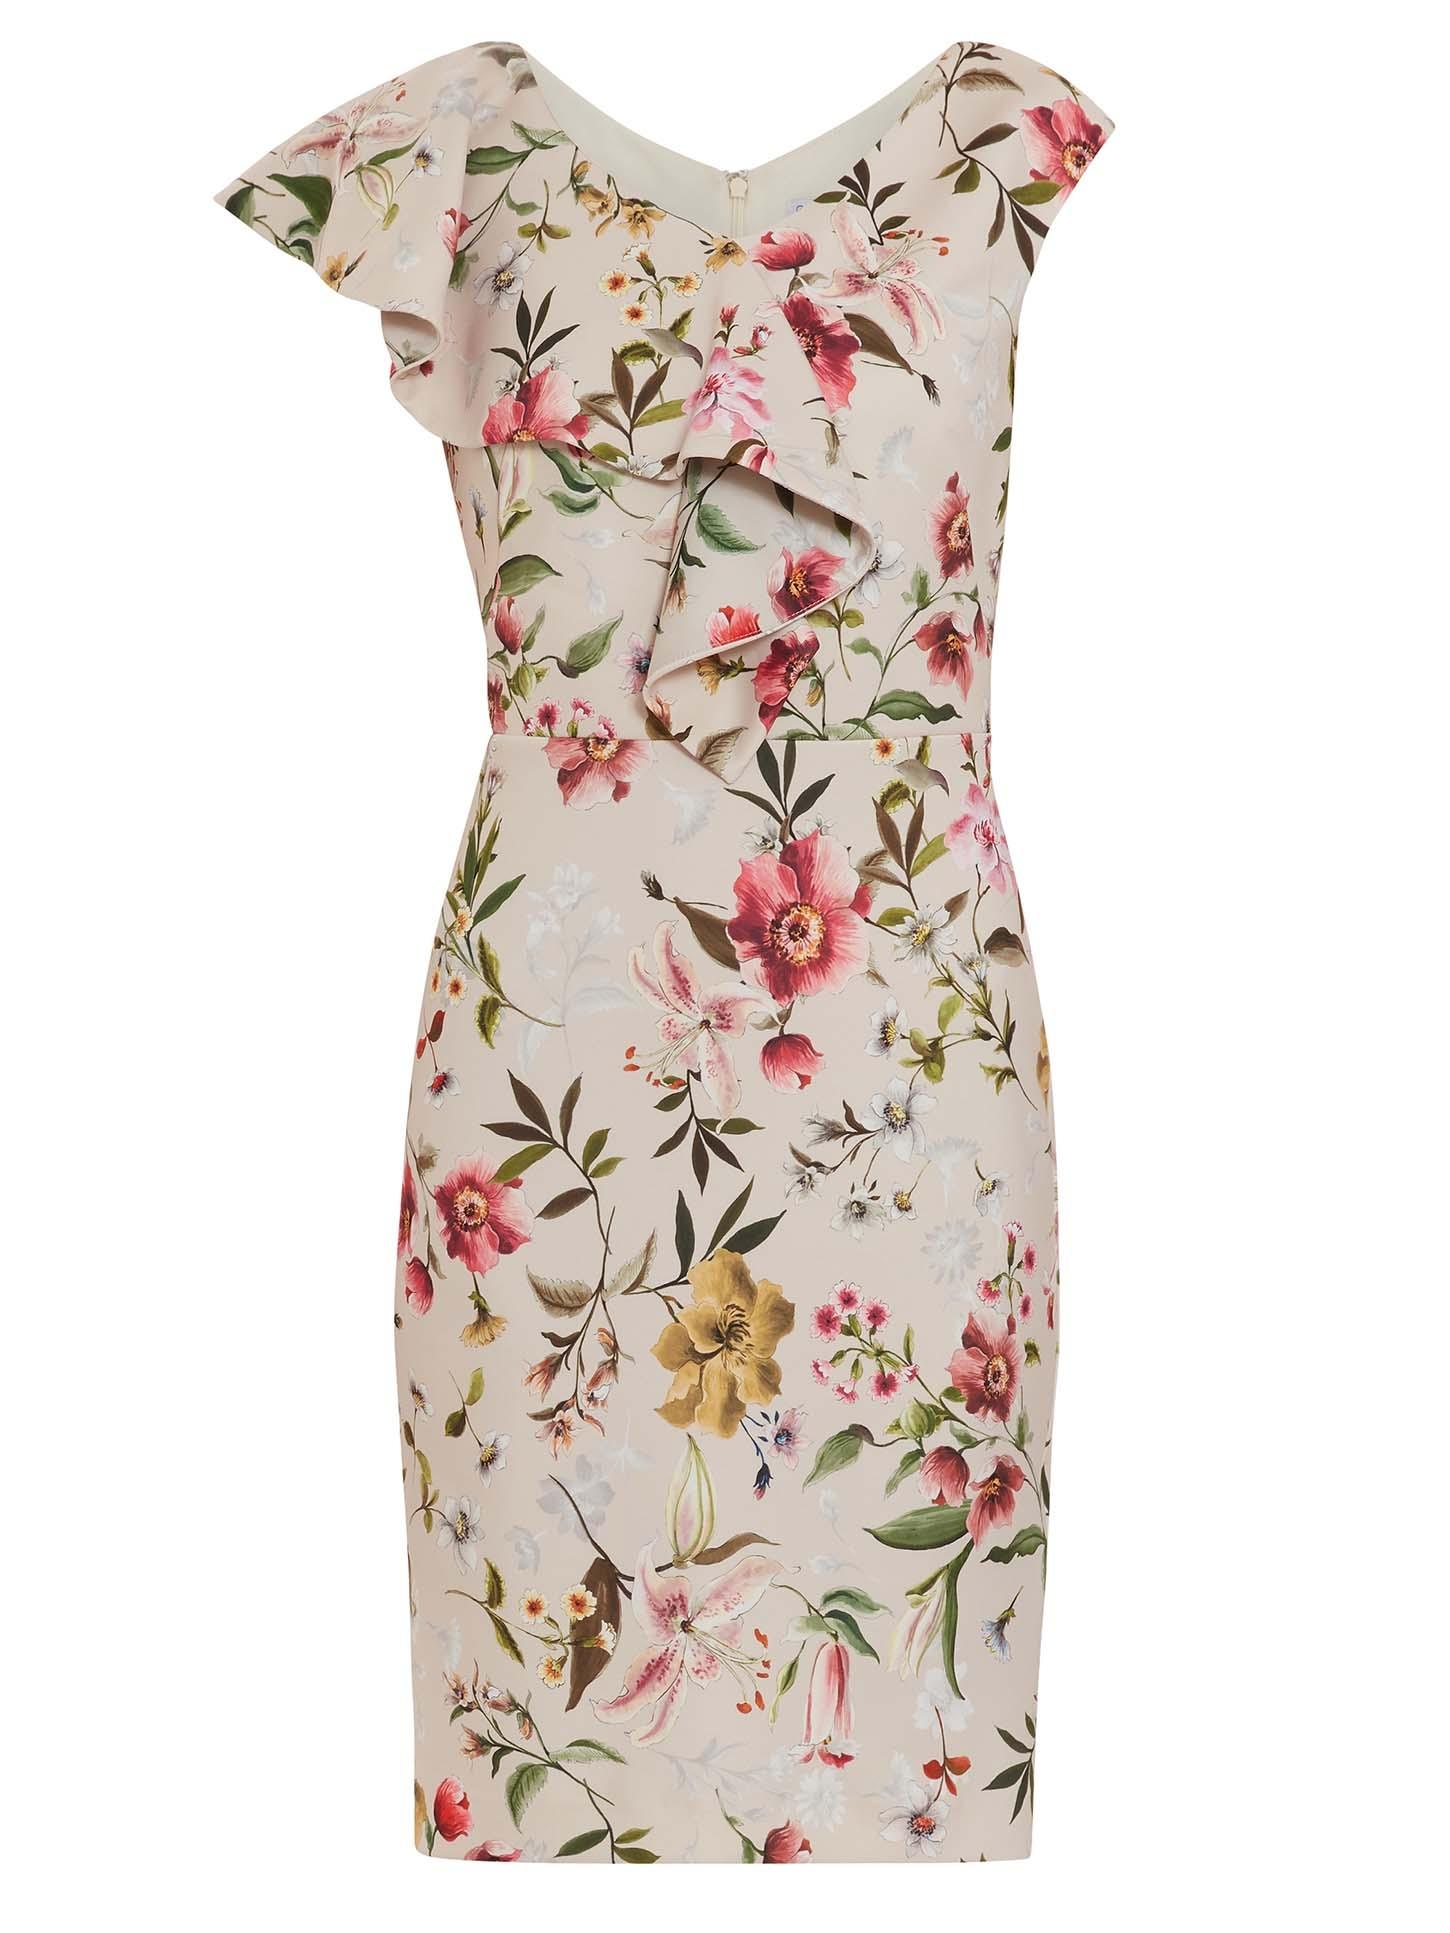 Darcella Floral Scuba Dress